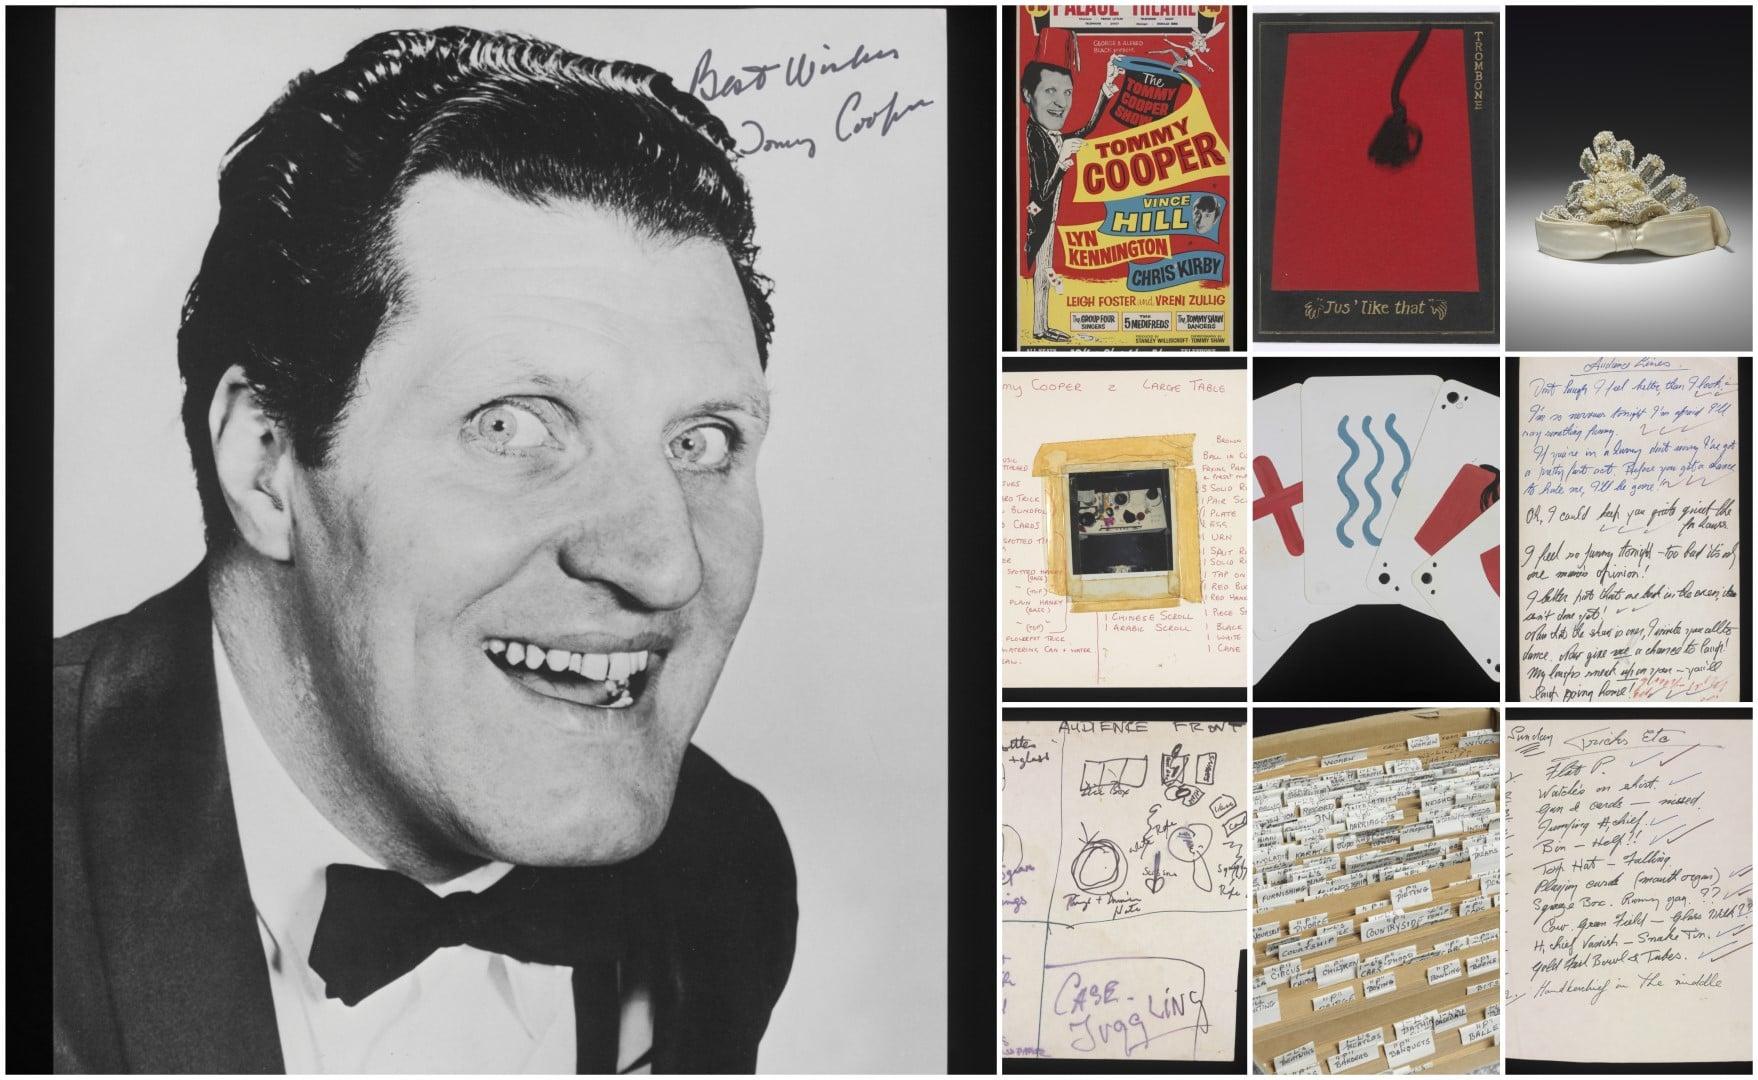 Tommy-Cooper & memorabilia in the V&A Museum